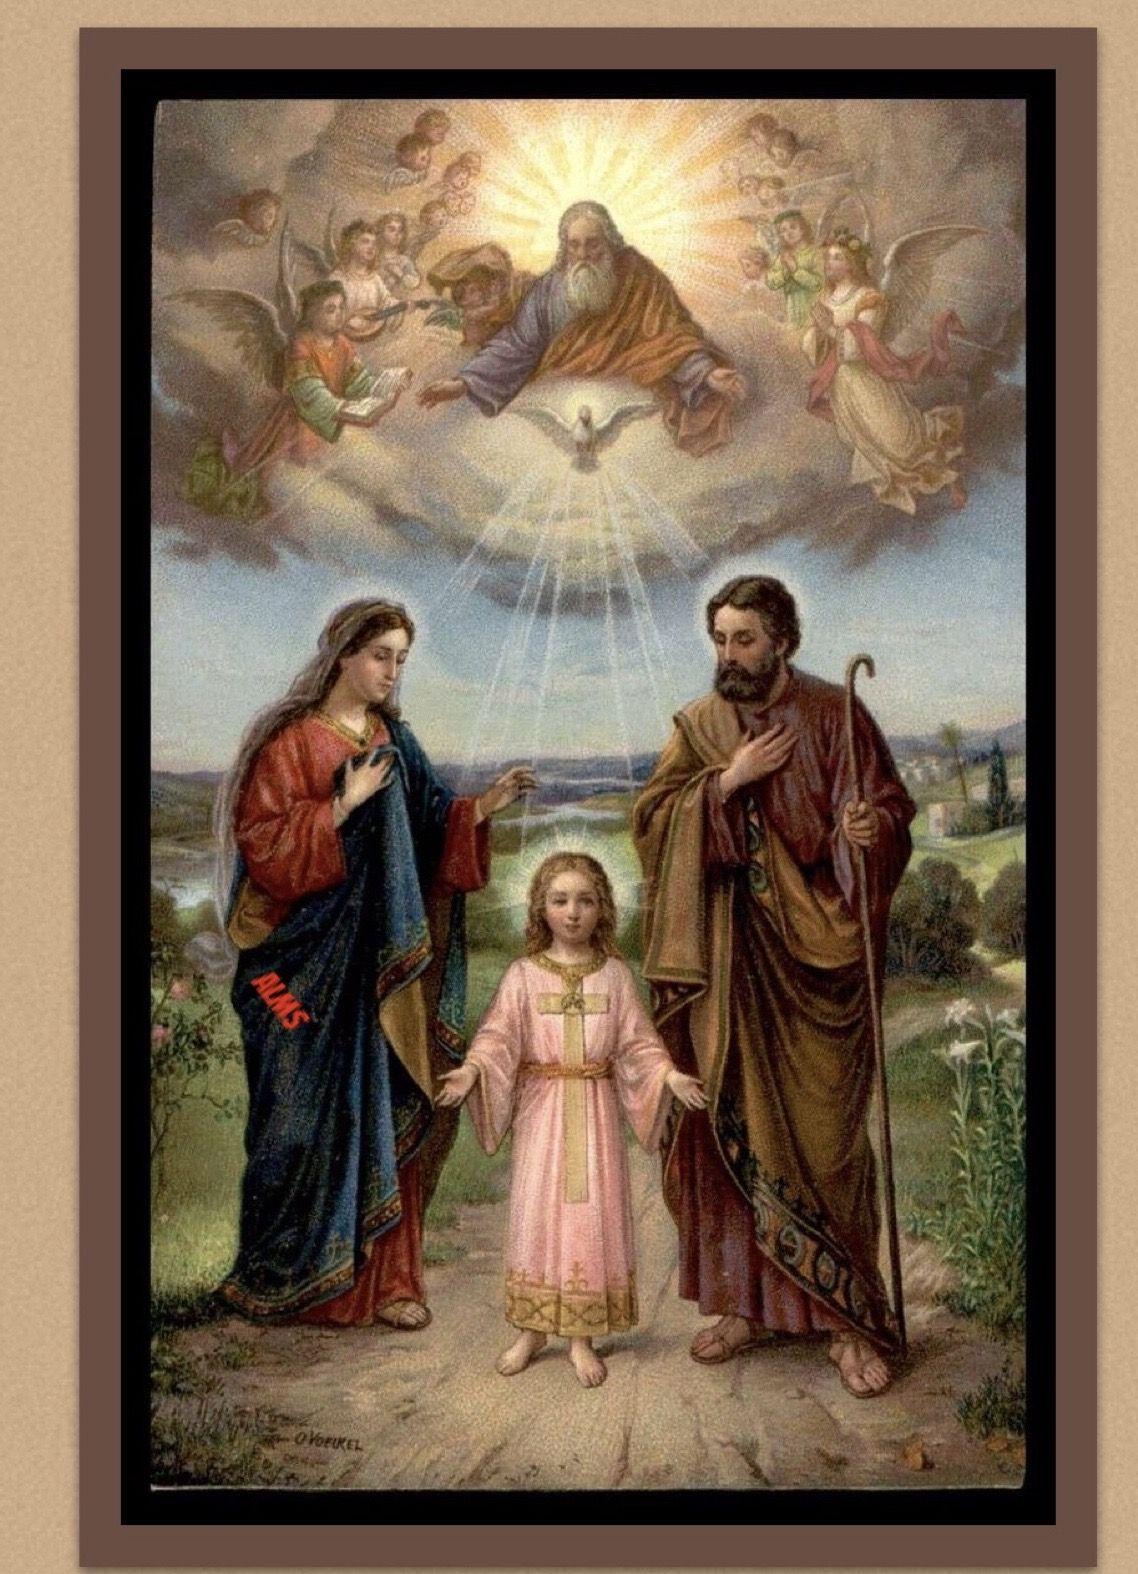 Sagrada Familia El Mismo Espíritu Santo Que La Animó También Anima A La Familia Imagen Sagrada Familia Sagrada Familia De Nazareth Sagrada Familia De Nazaret